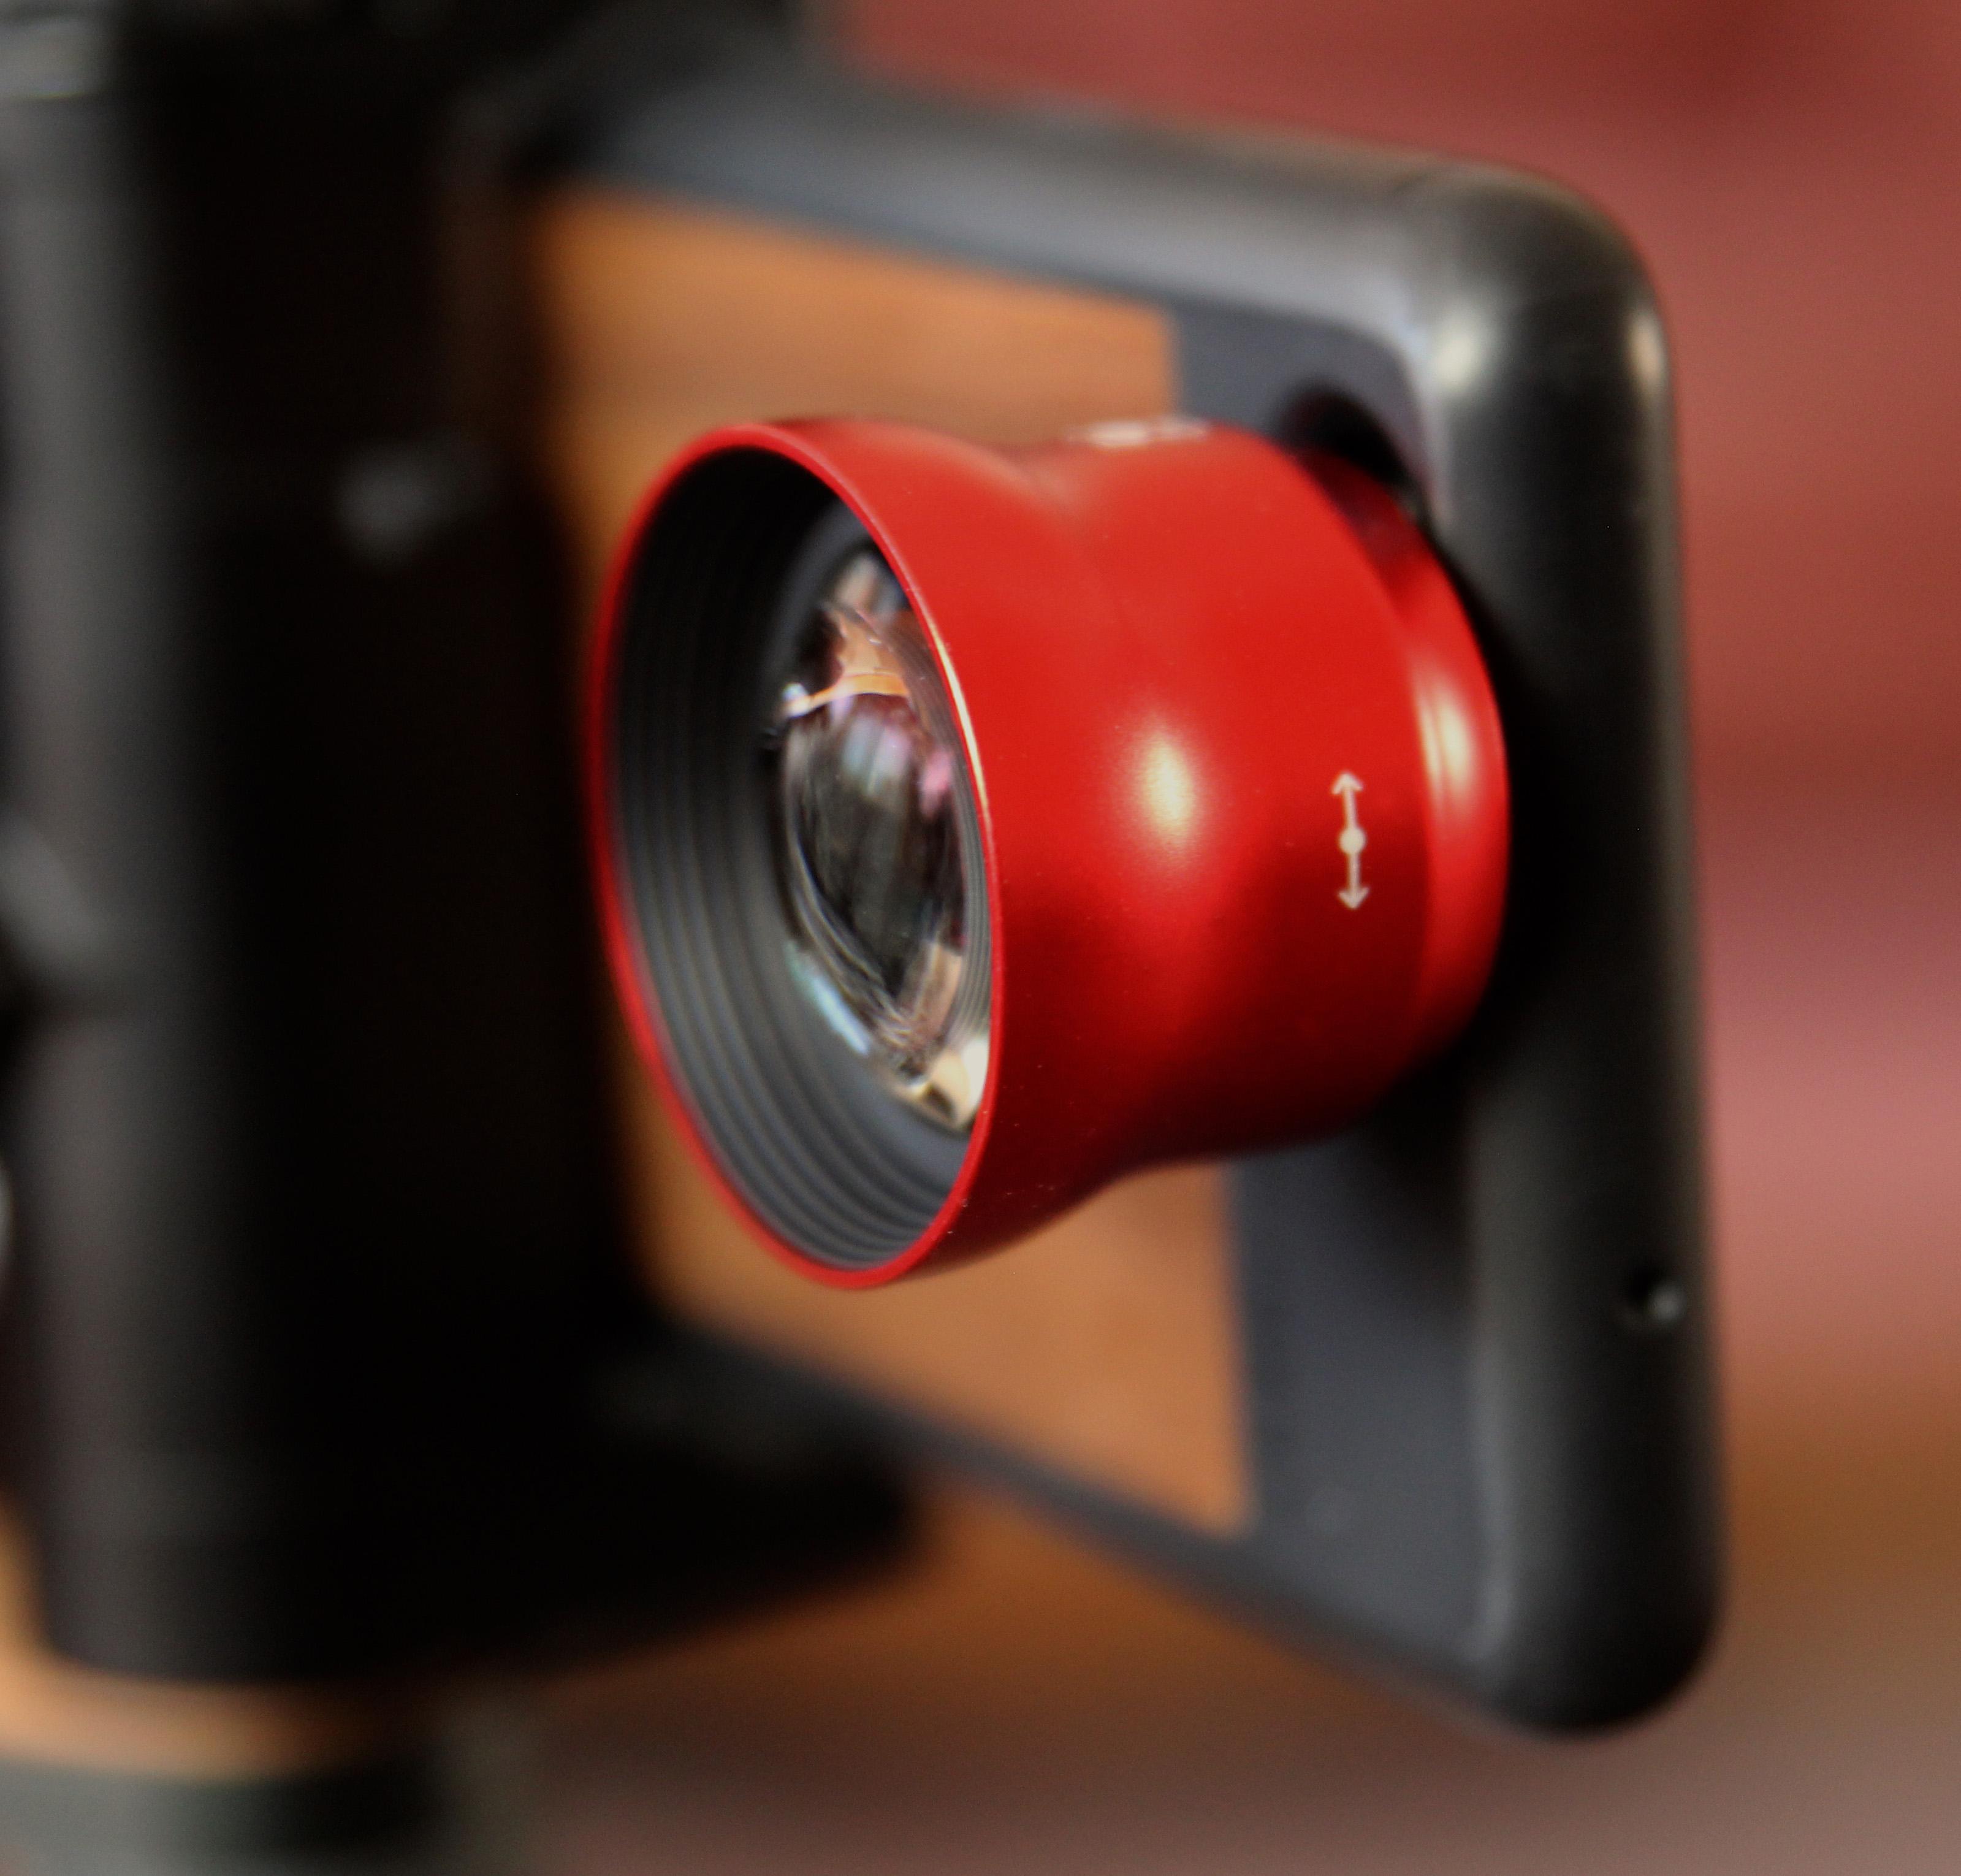 sirui tele lens